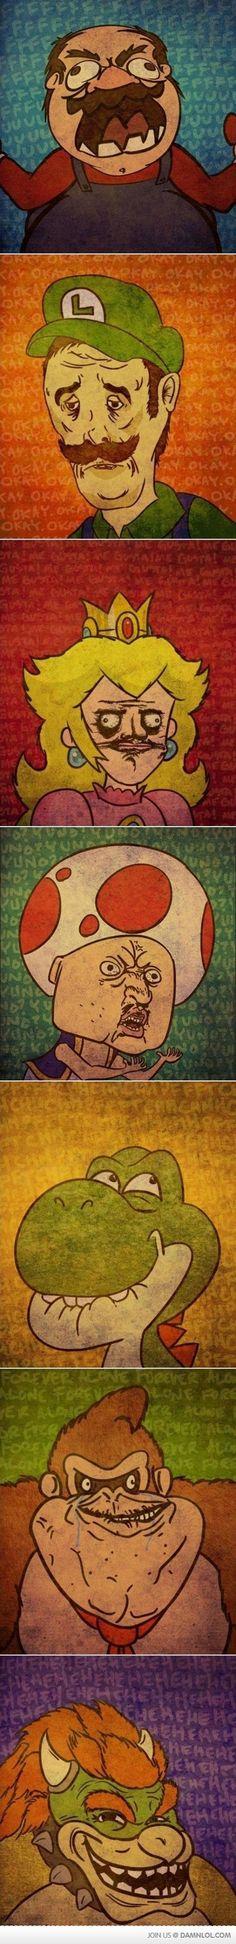 Nintendo Rage Faces Memes | Mario, Luigi, Peach, Toad, Yoshi, DonkeyKong, Bowser